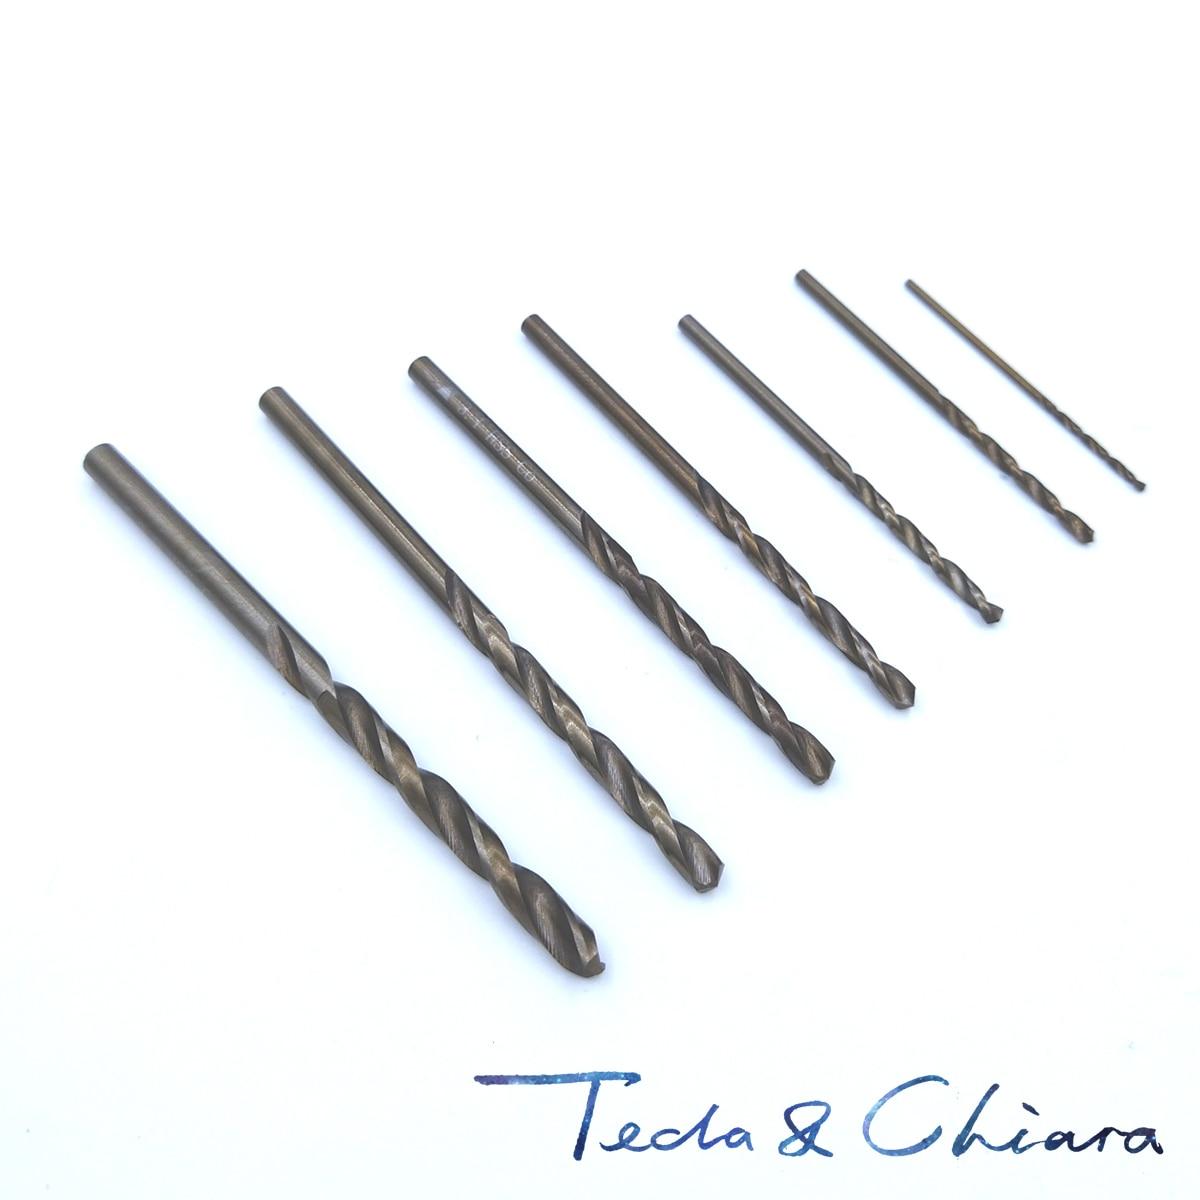 1Pcs 3-13mm HSS-Co M35 Cobalt Step Drill Bit 1//4 Inch Hex Shank Metalworking Bit